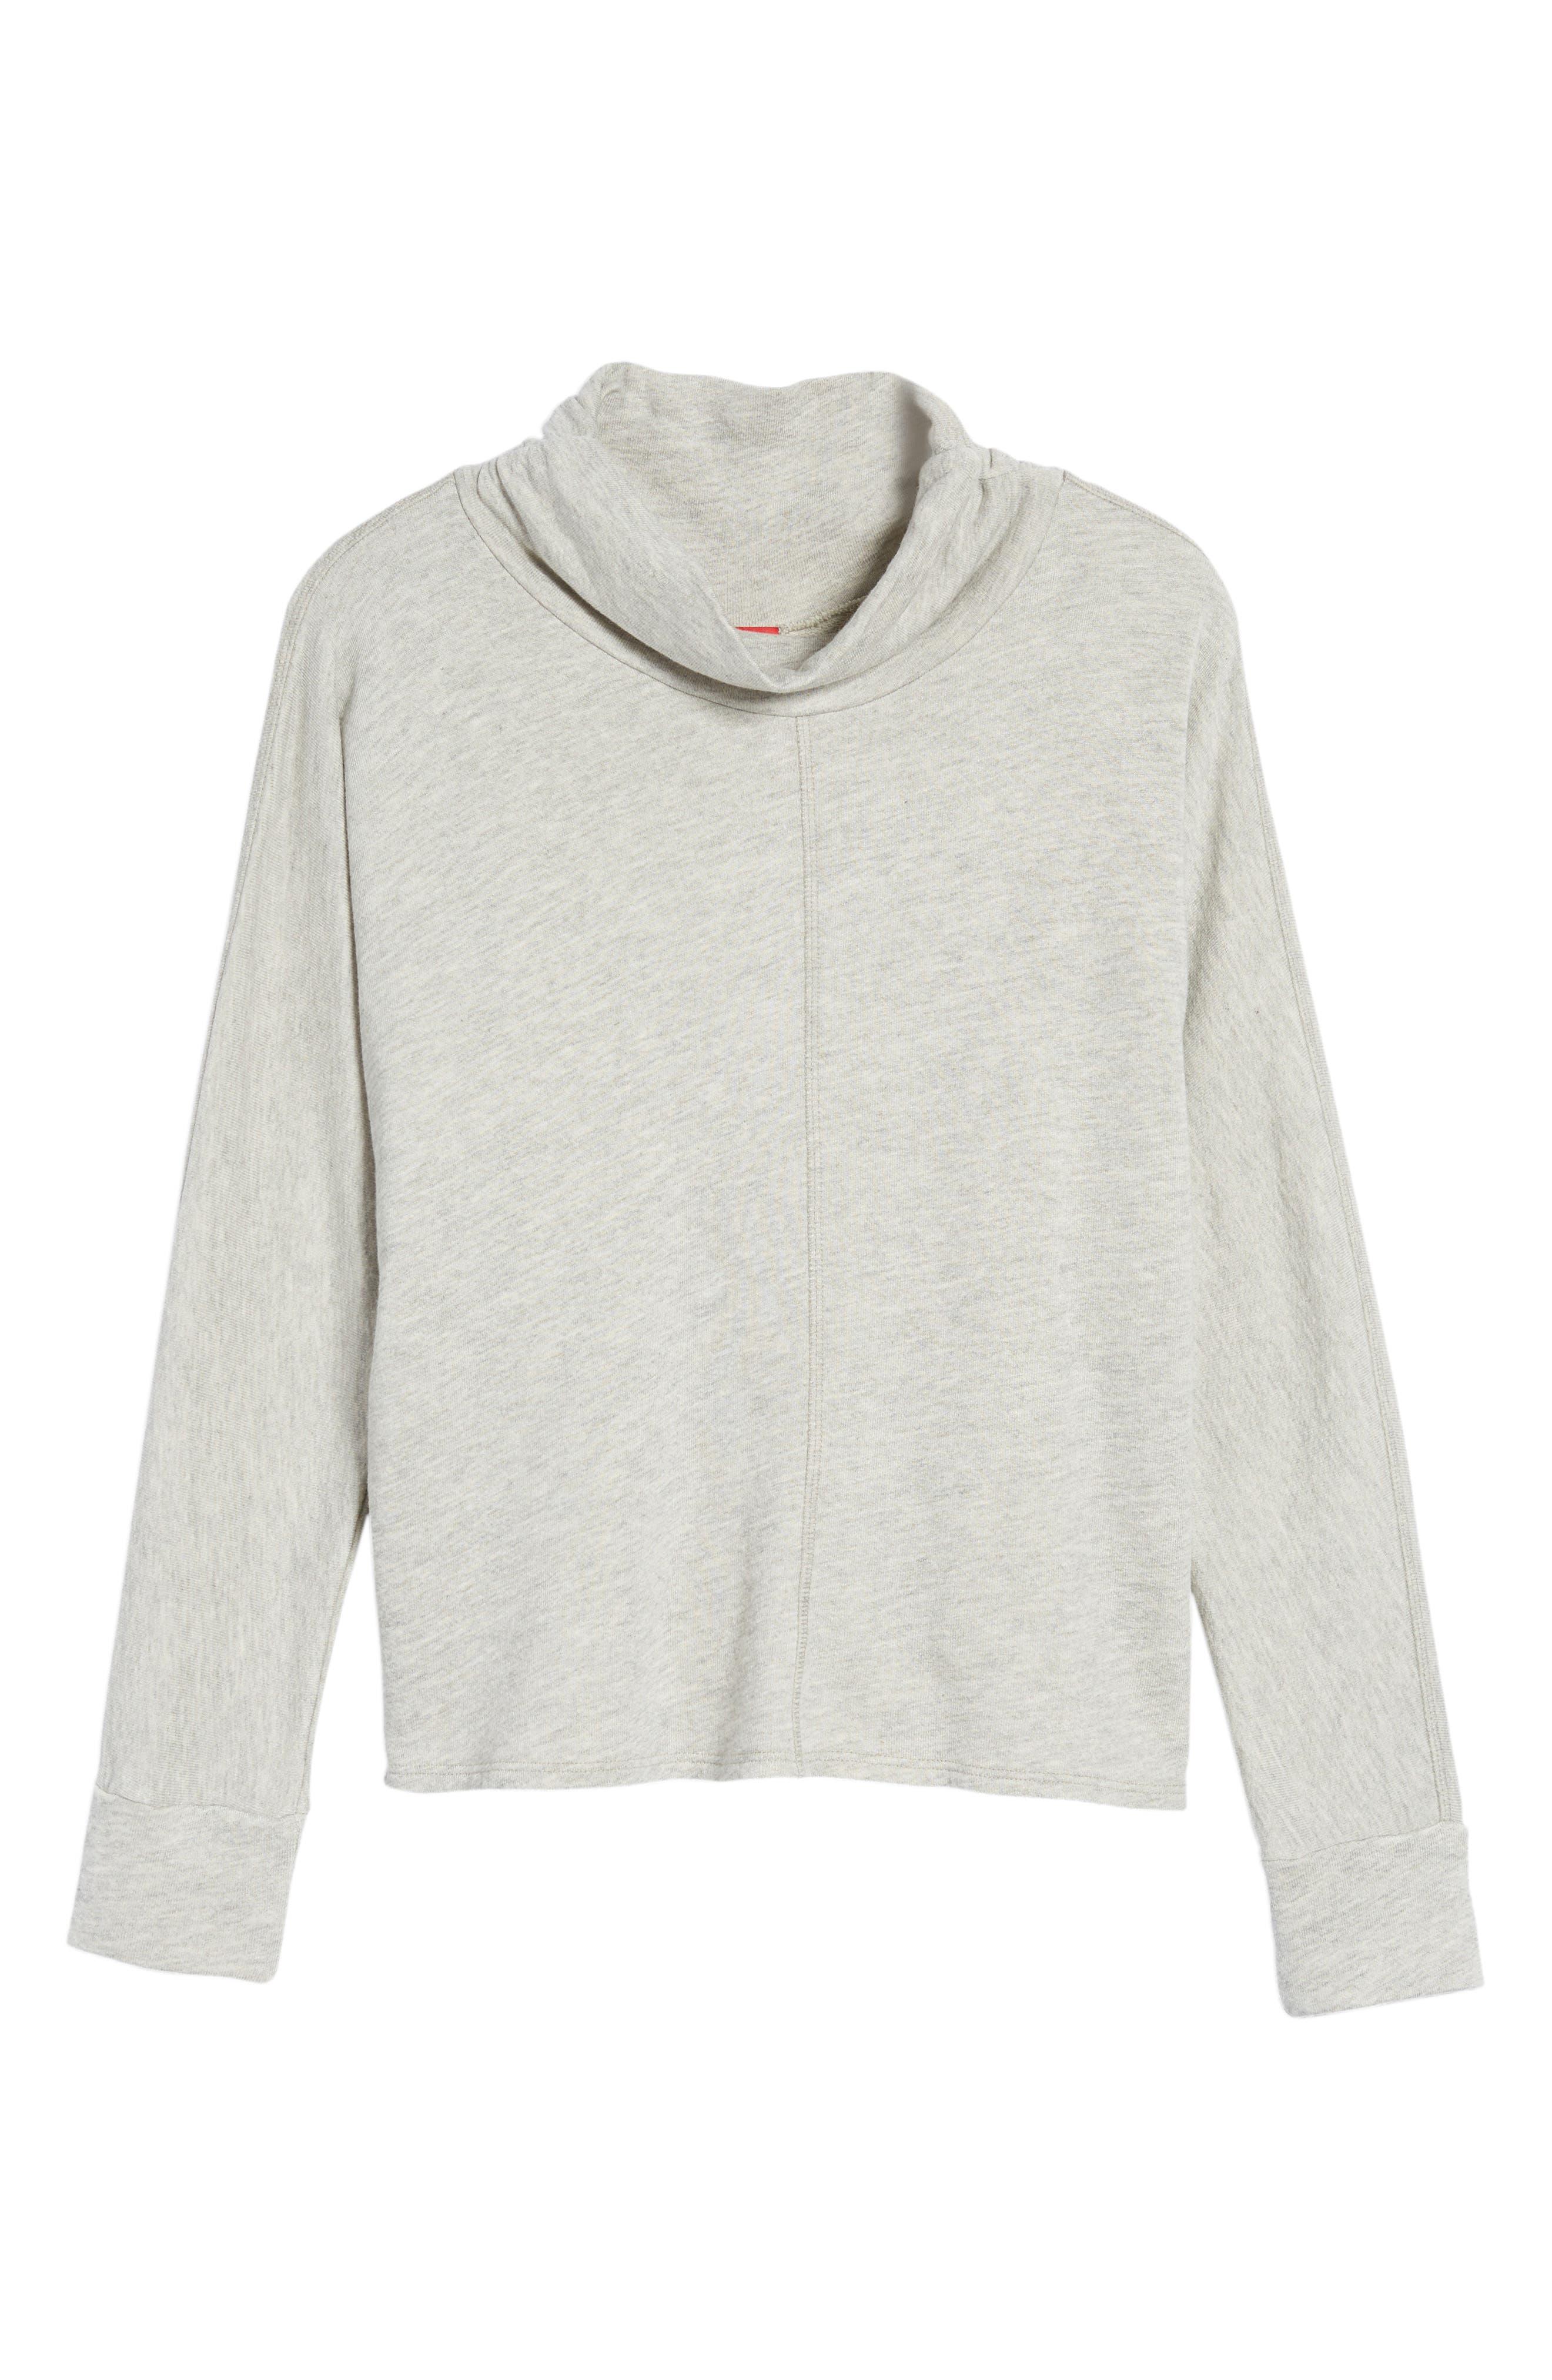 Helix Turtleneck Sweatshirt,                             Alternate thumbnail 6, color,                             Heather Grey